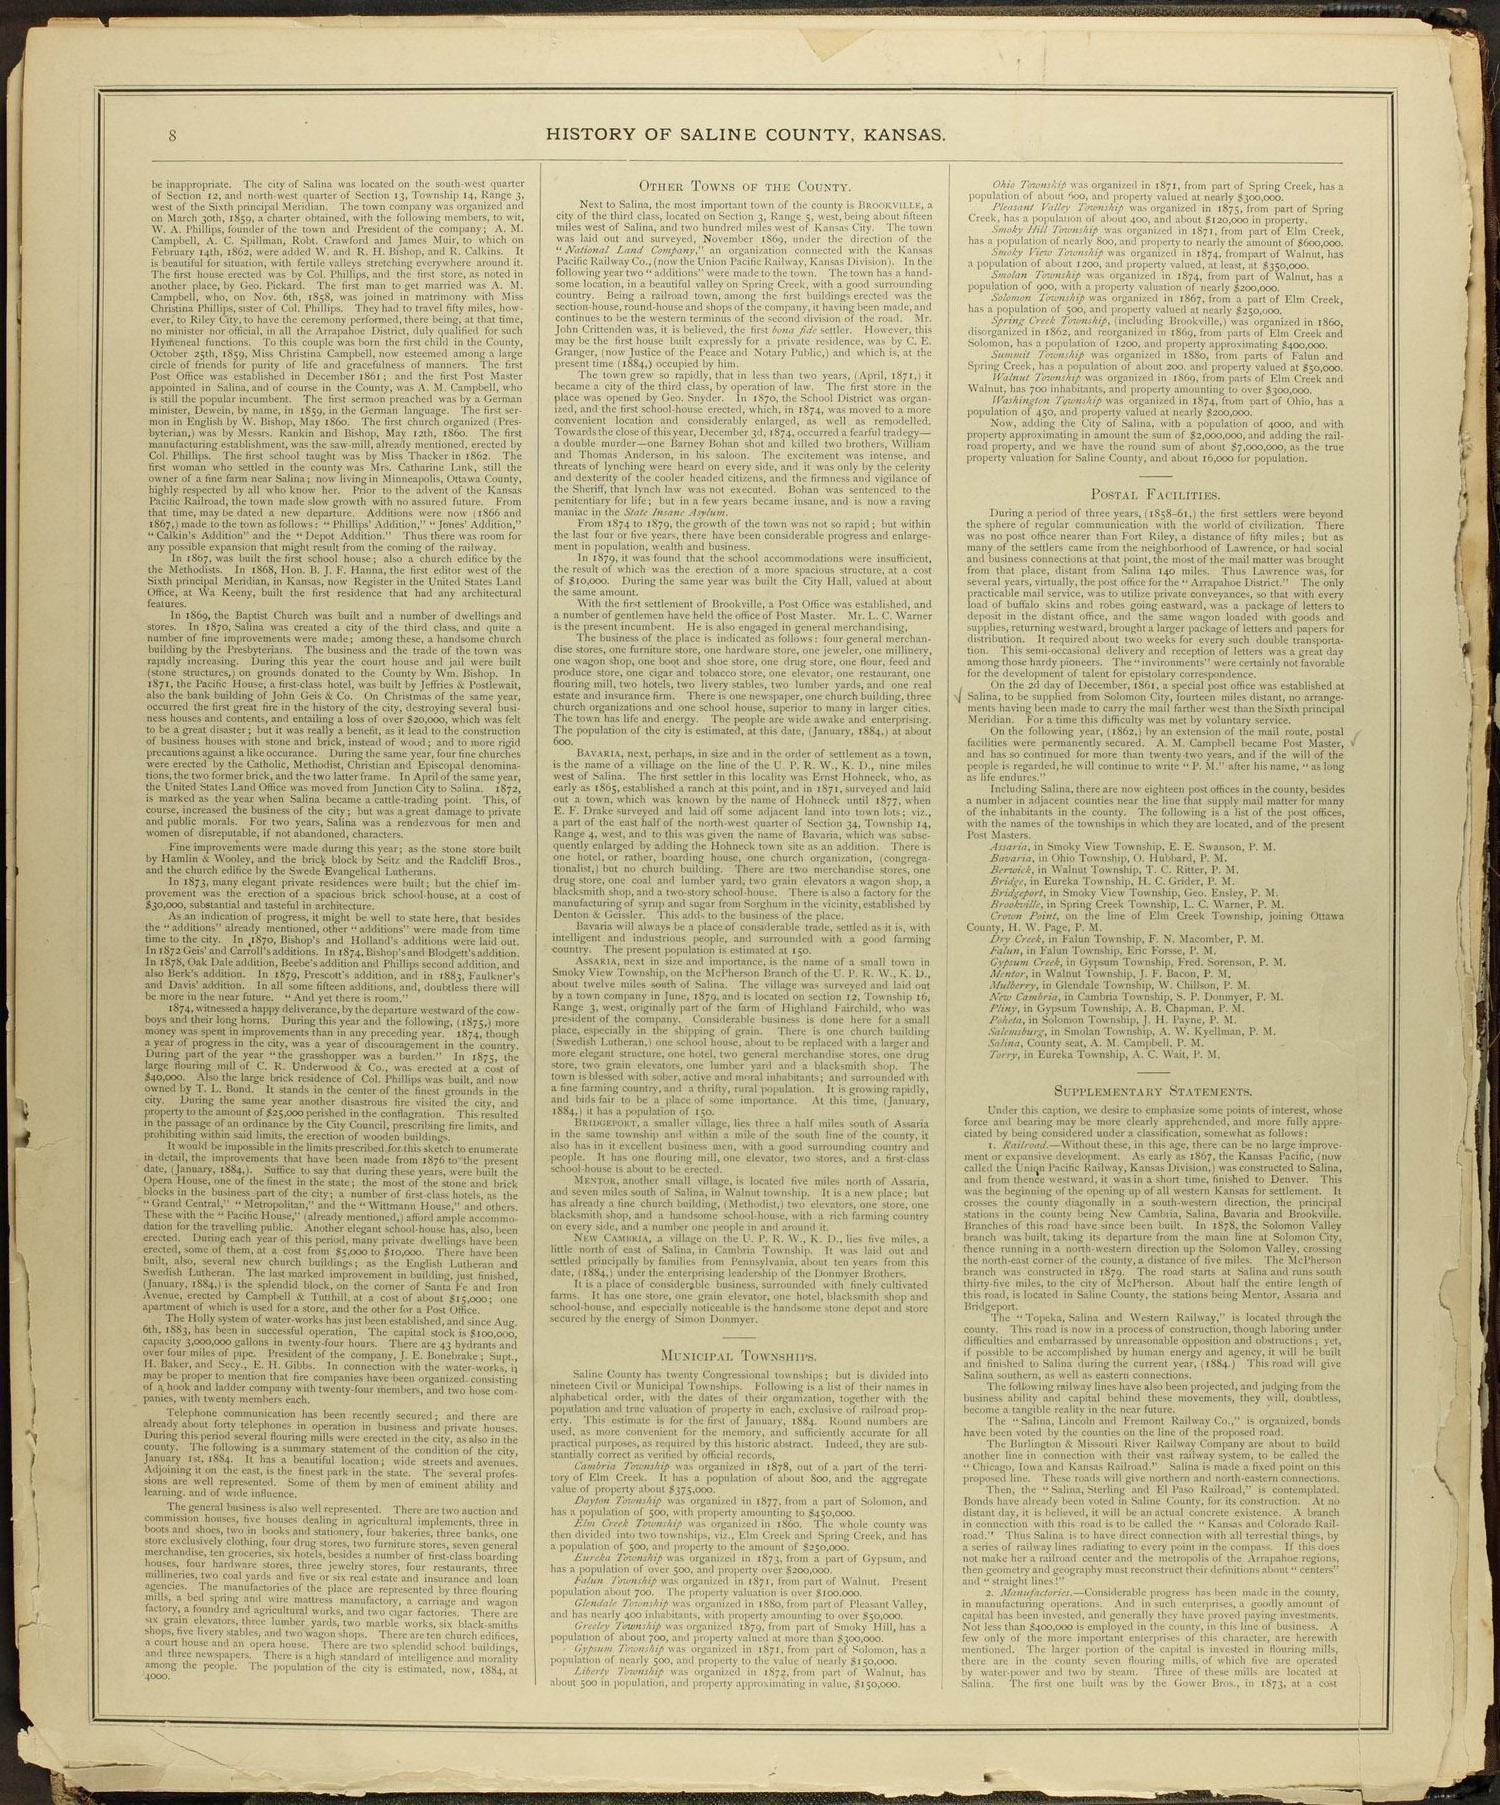 Edwards' Atlas of Saline Co., Kansas - 8